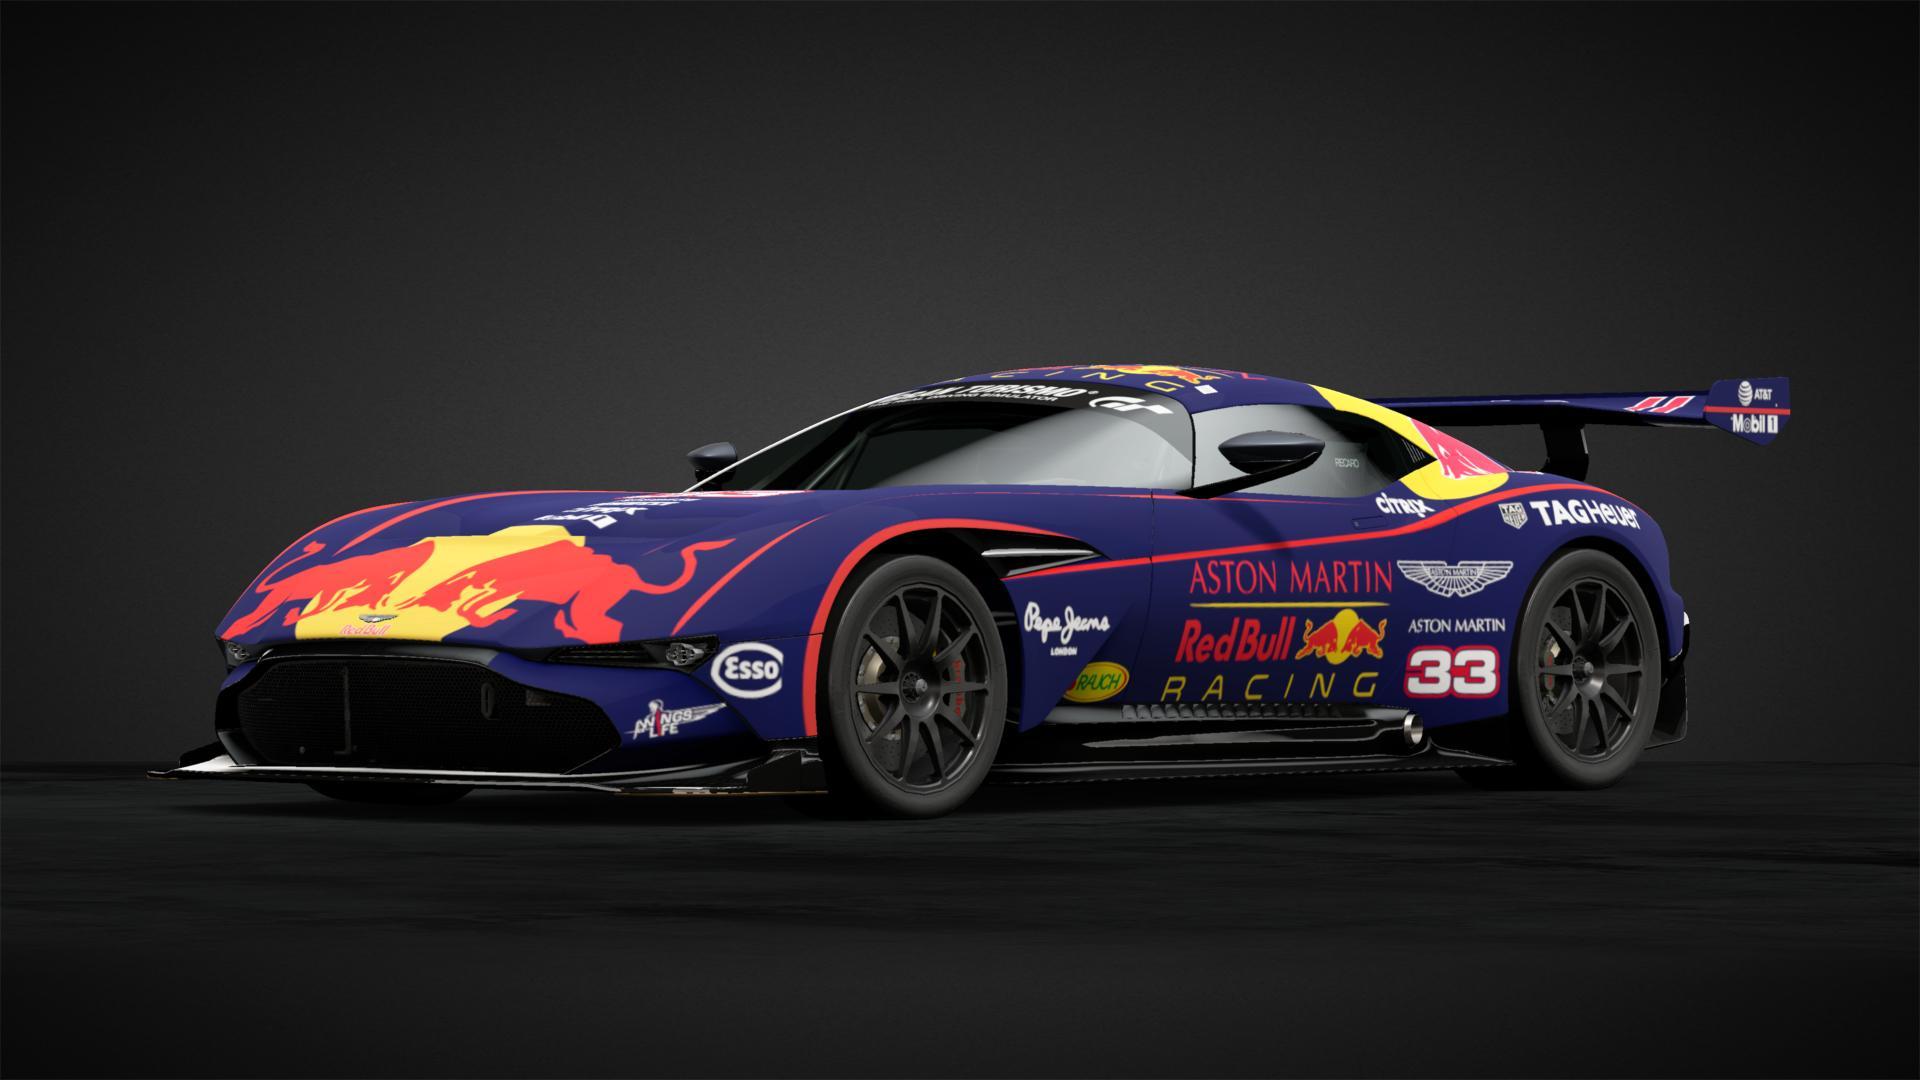 Red Bull Aston Martin Vulcan 33 Car Livery By Jackcsh1 Community Gran Turismo Sport